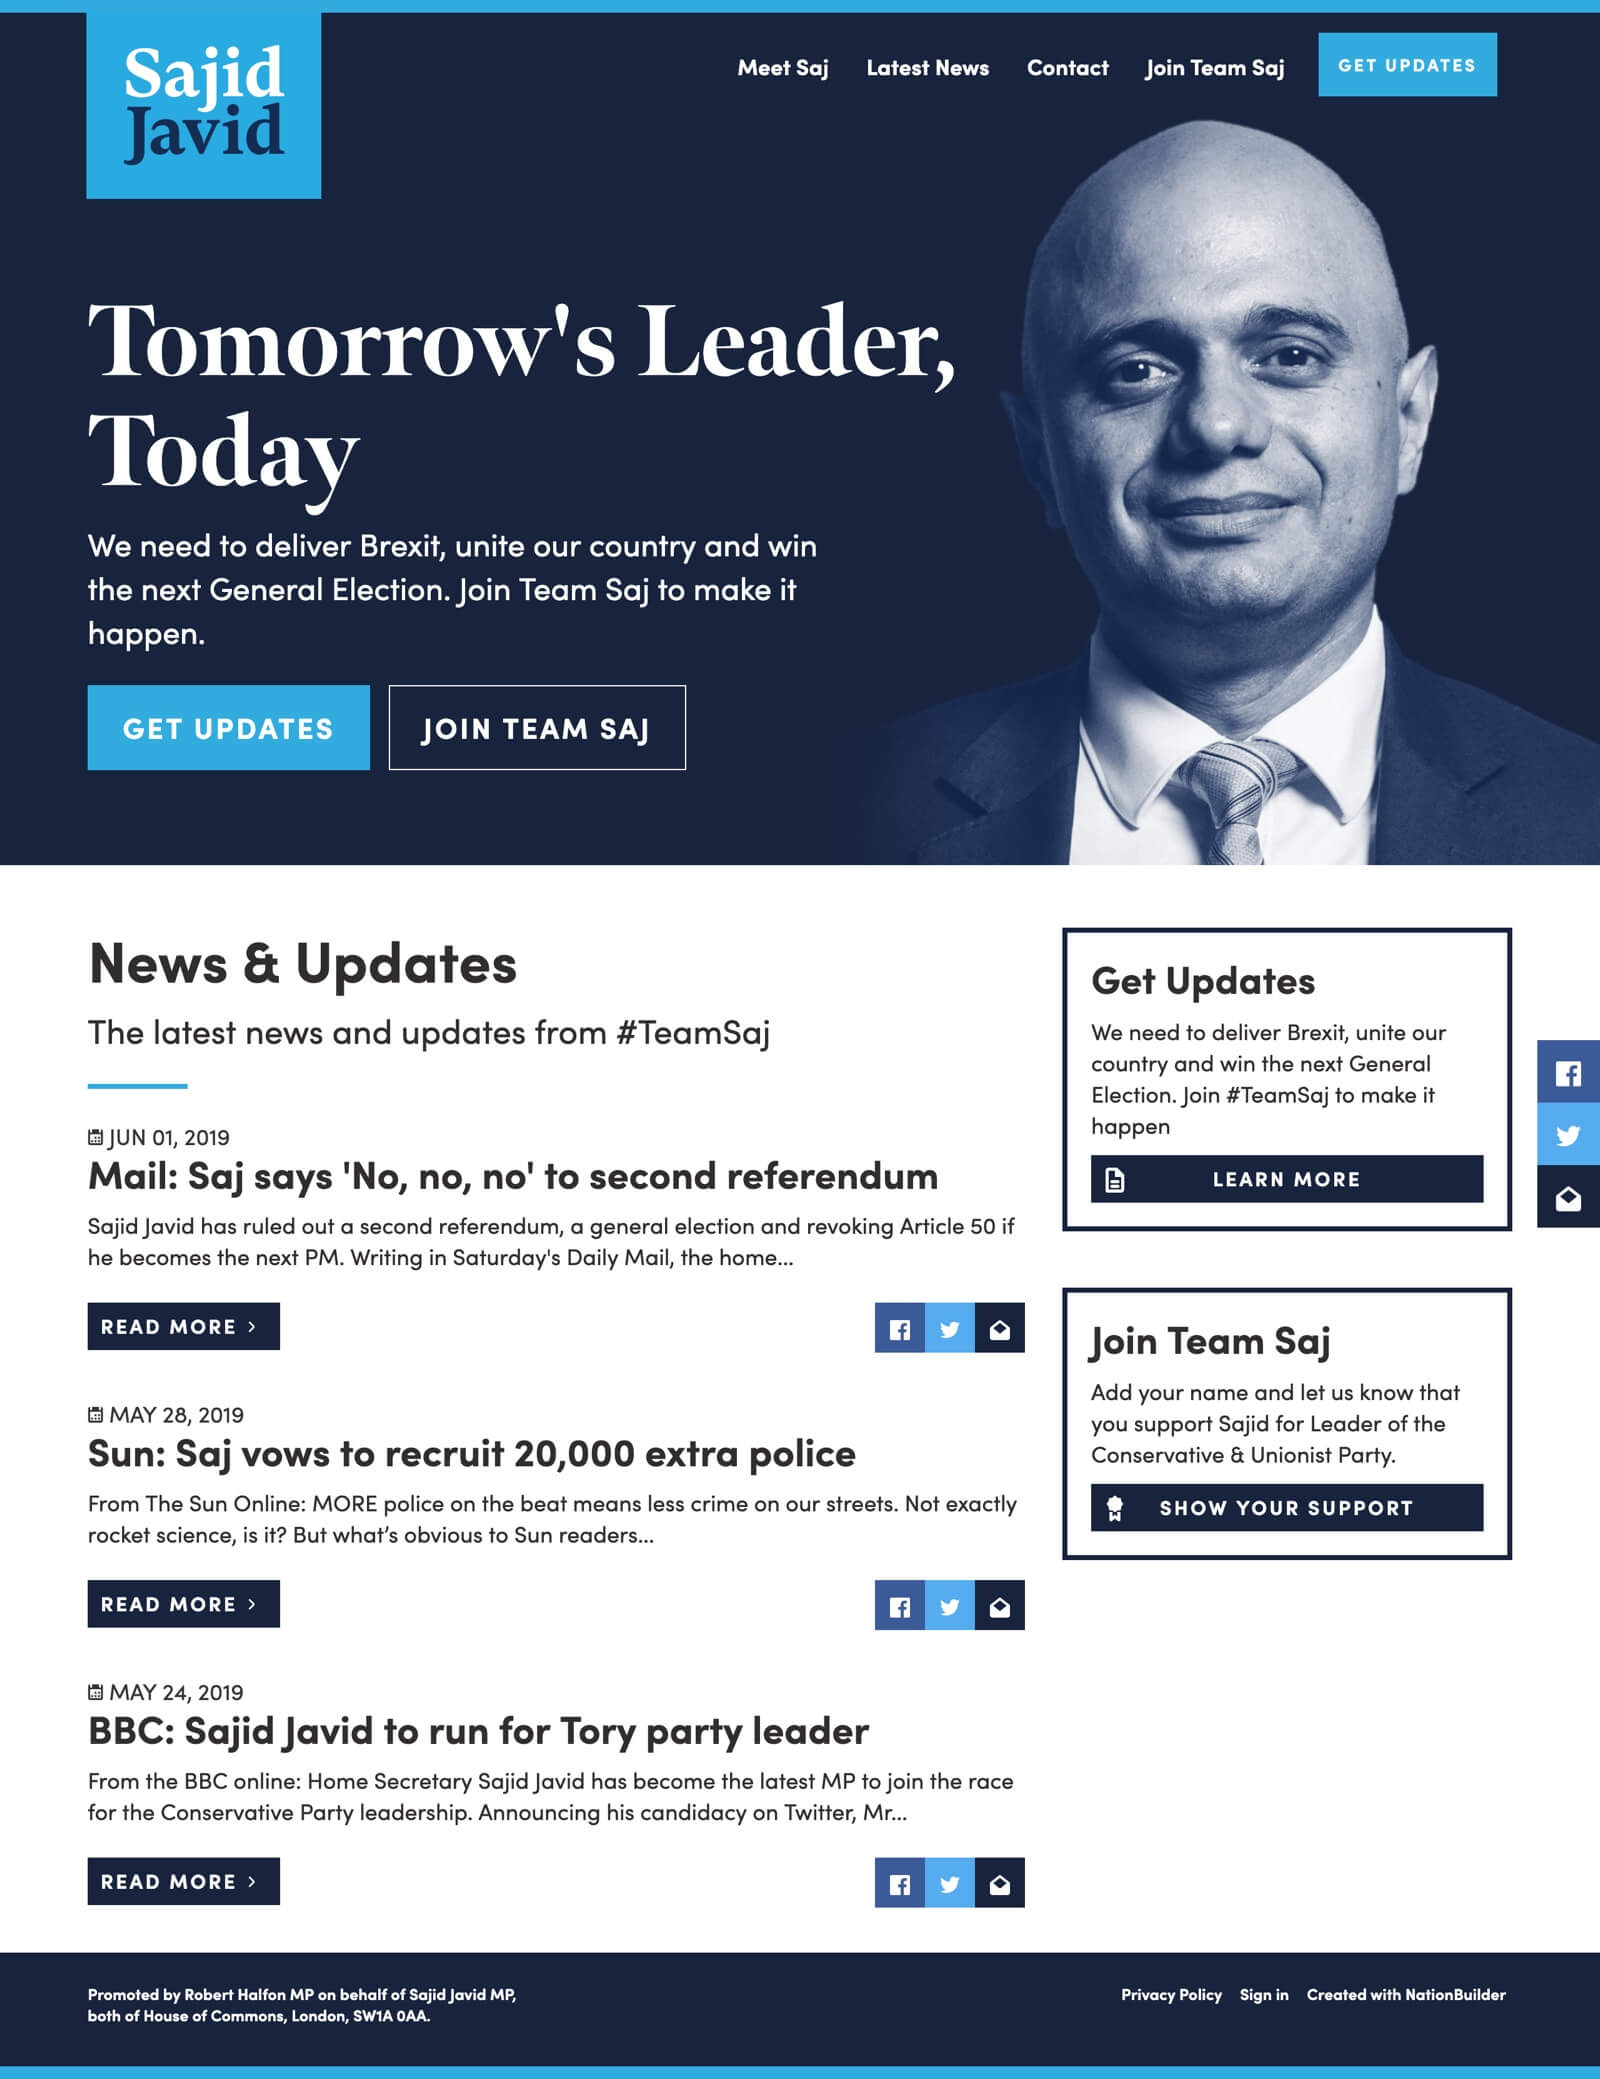 Screenshot: The Homepage